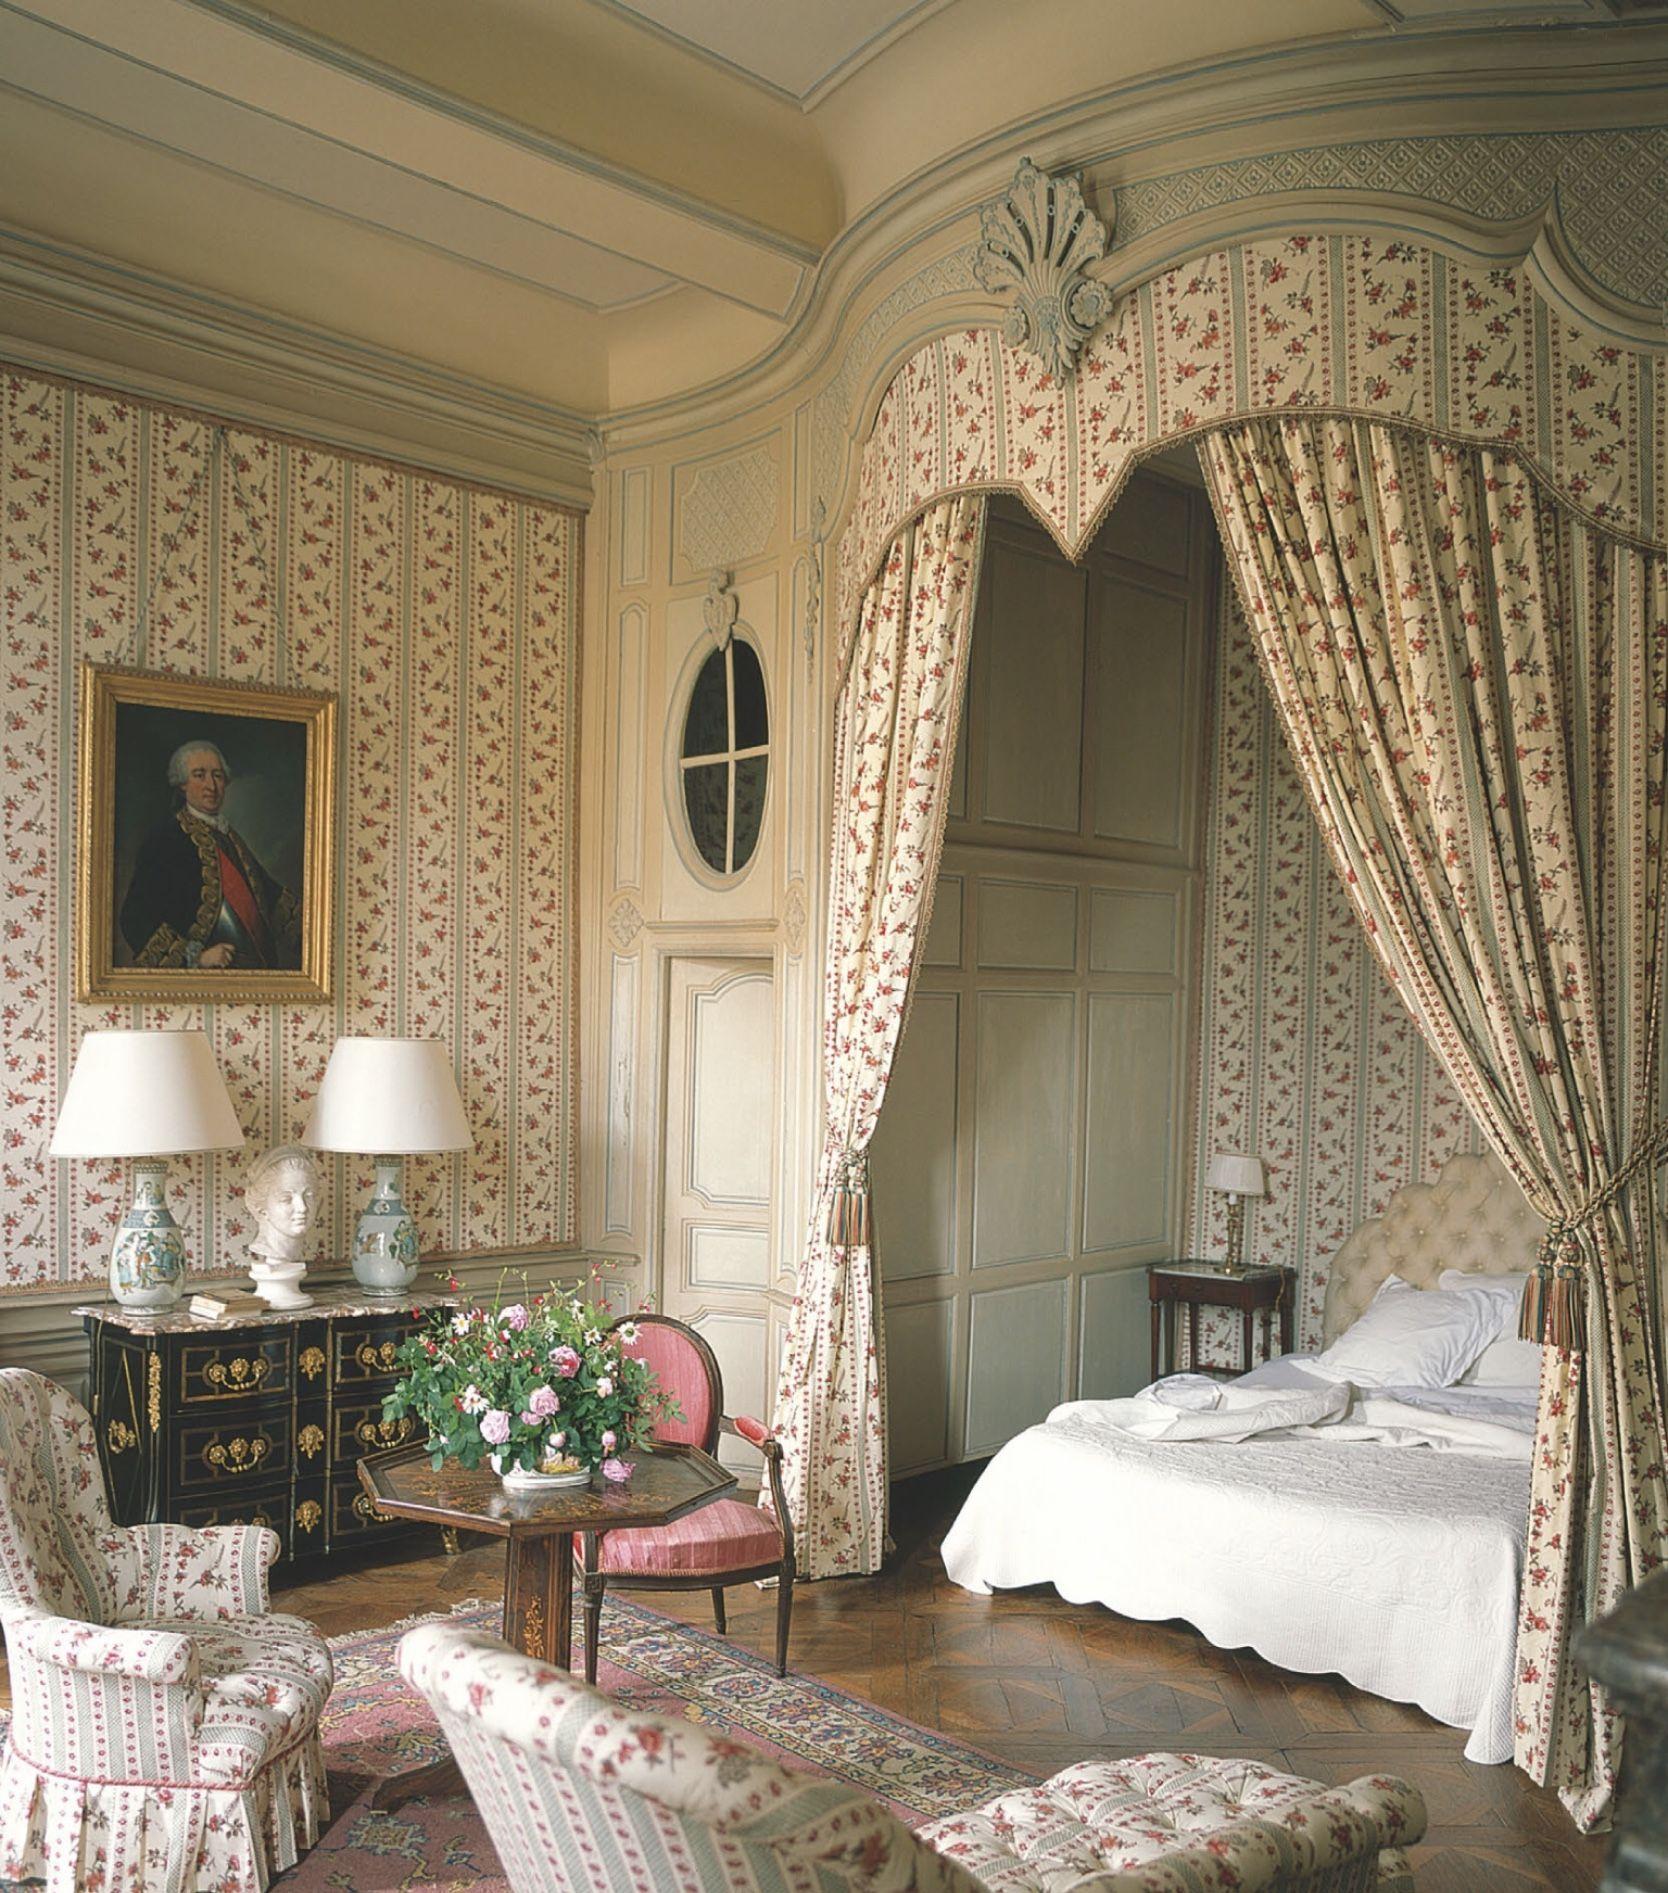 Idea by Nicolas Fairford on Interiors Bedroom interior